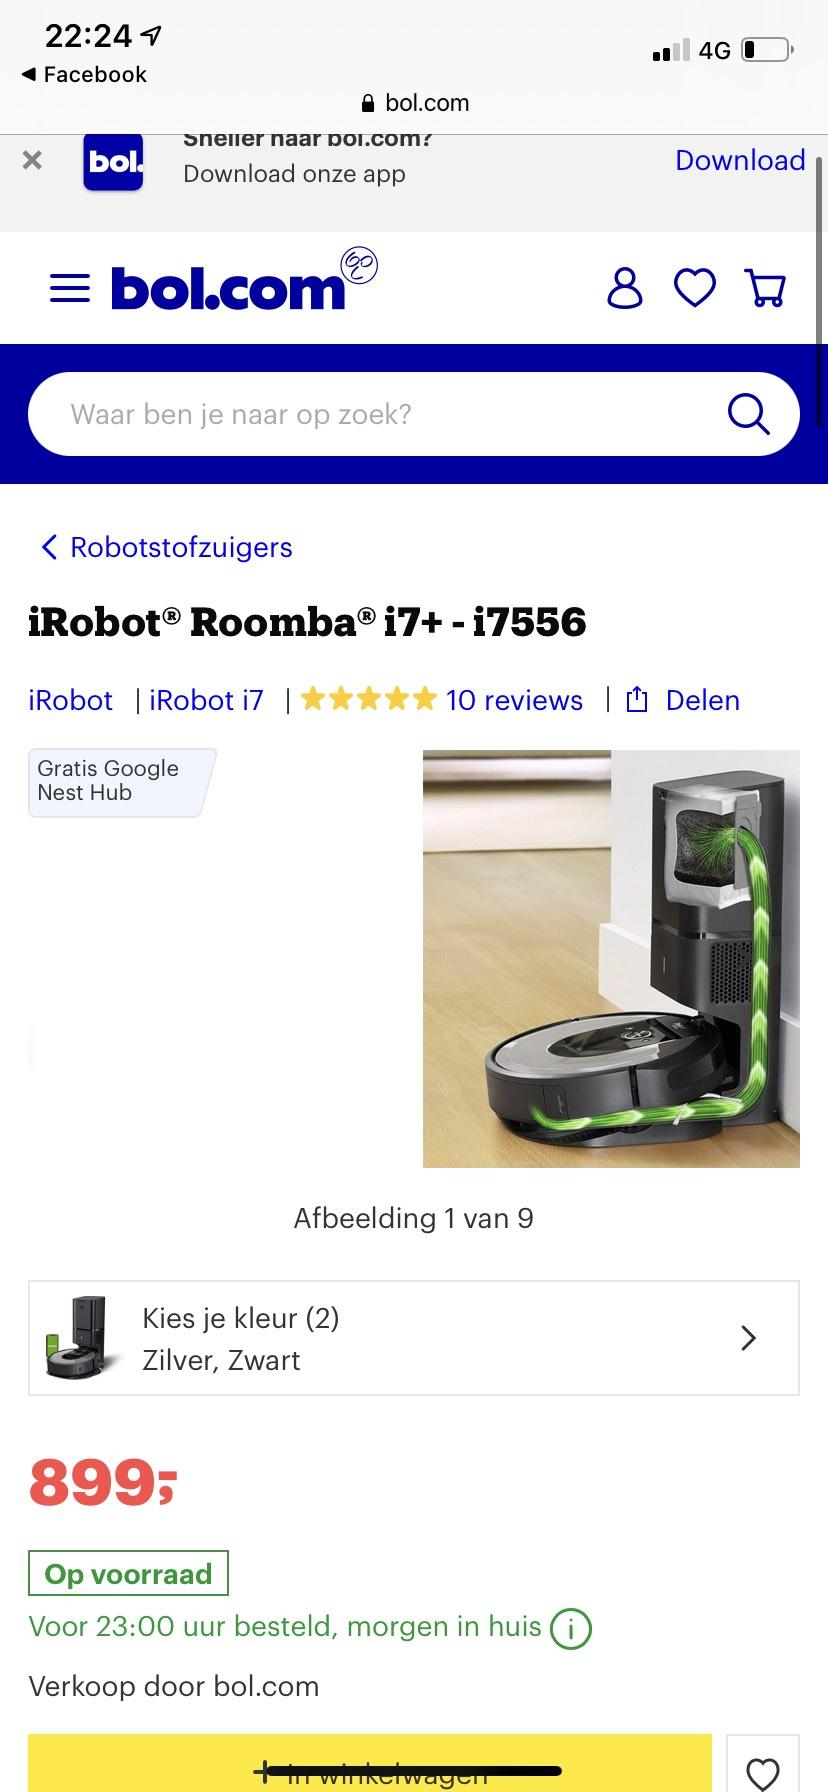 iRobot roomba i7+ i7556 met gratis Google nest hub